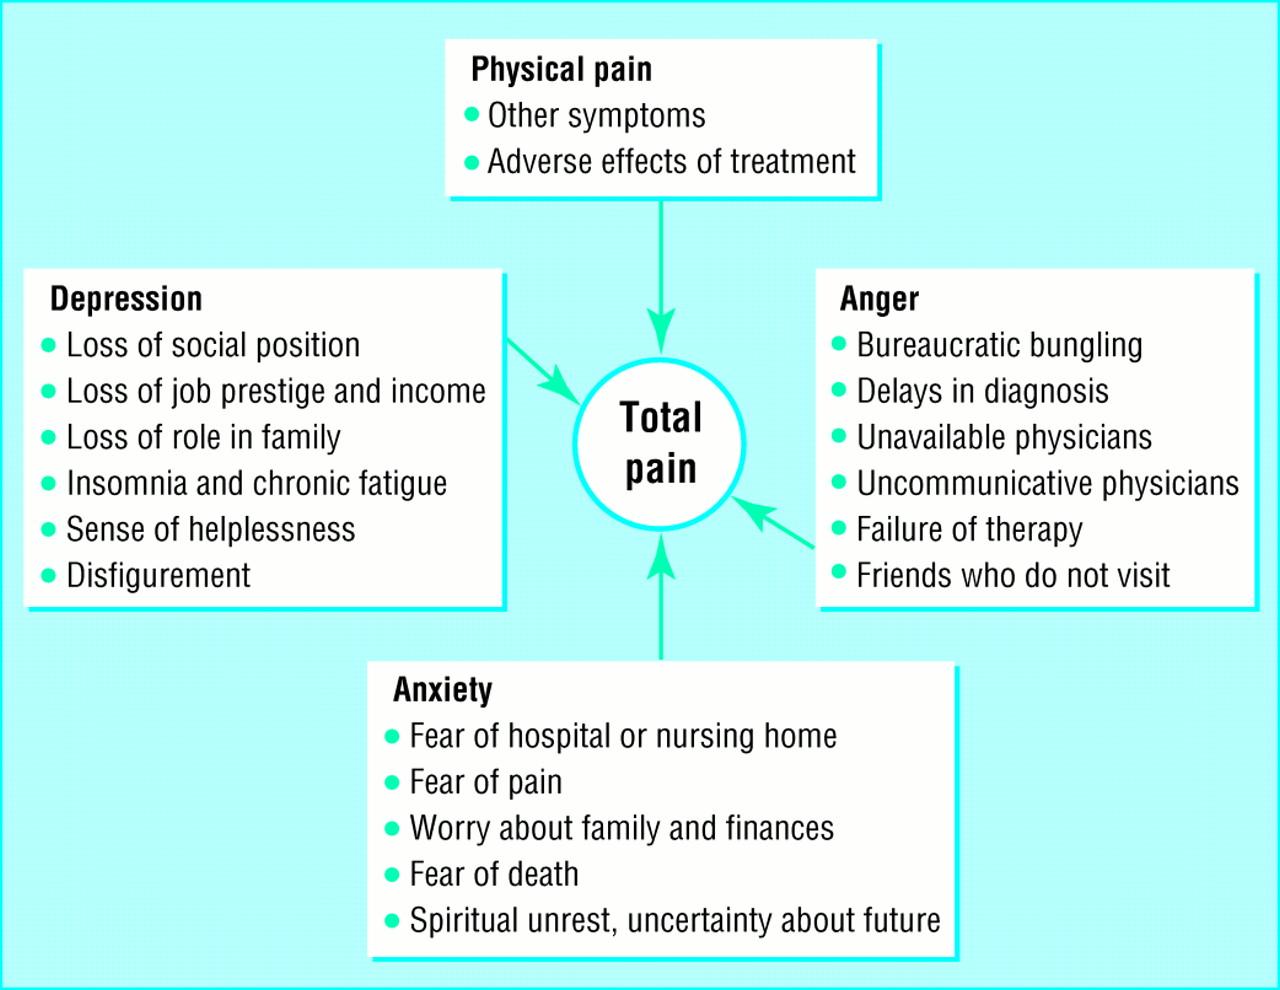 ABC of palliative care: Principles of palliative care and